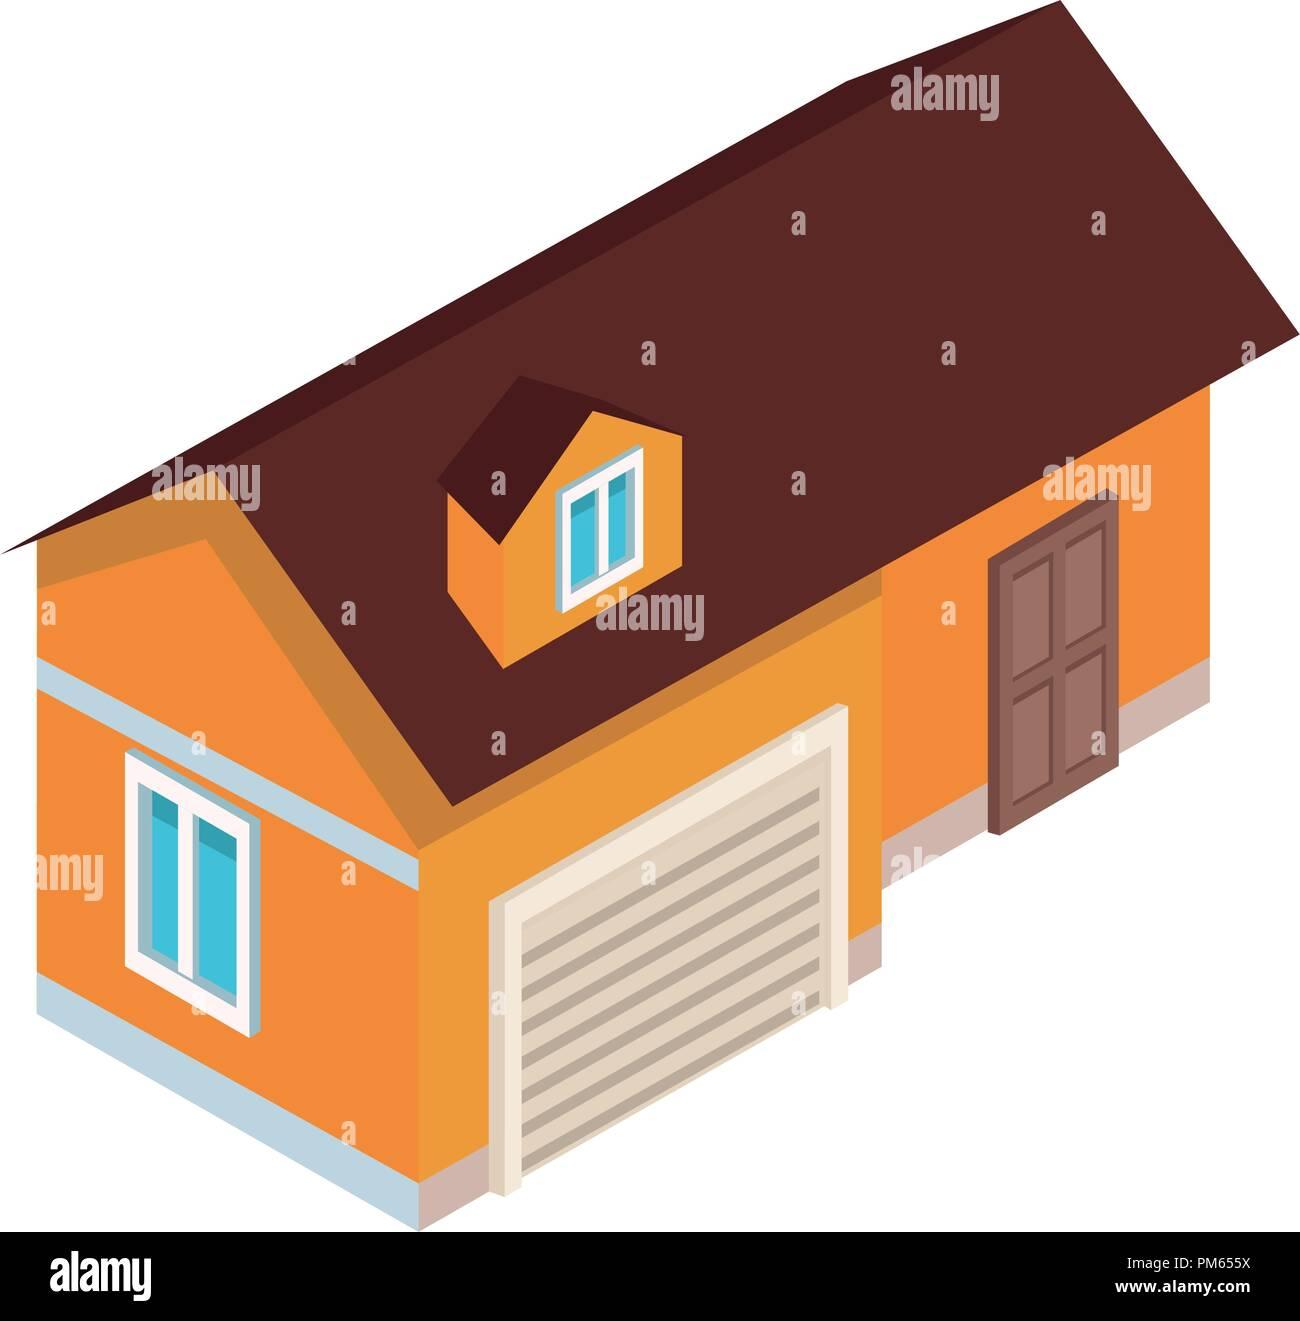 House isometric scenery - Stock Image